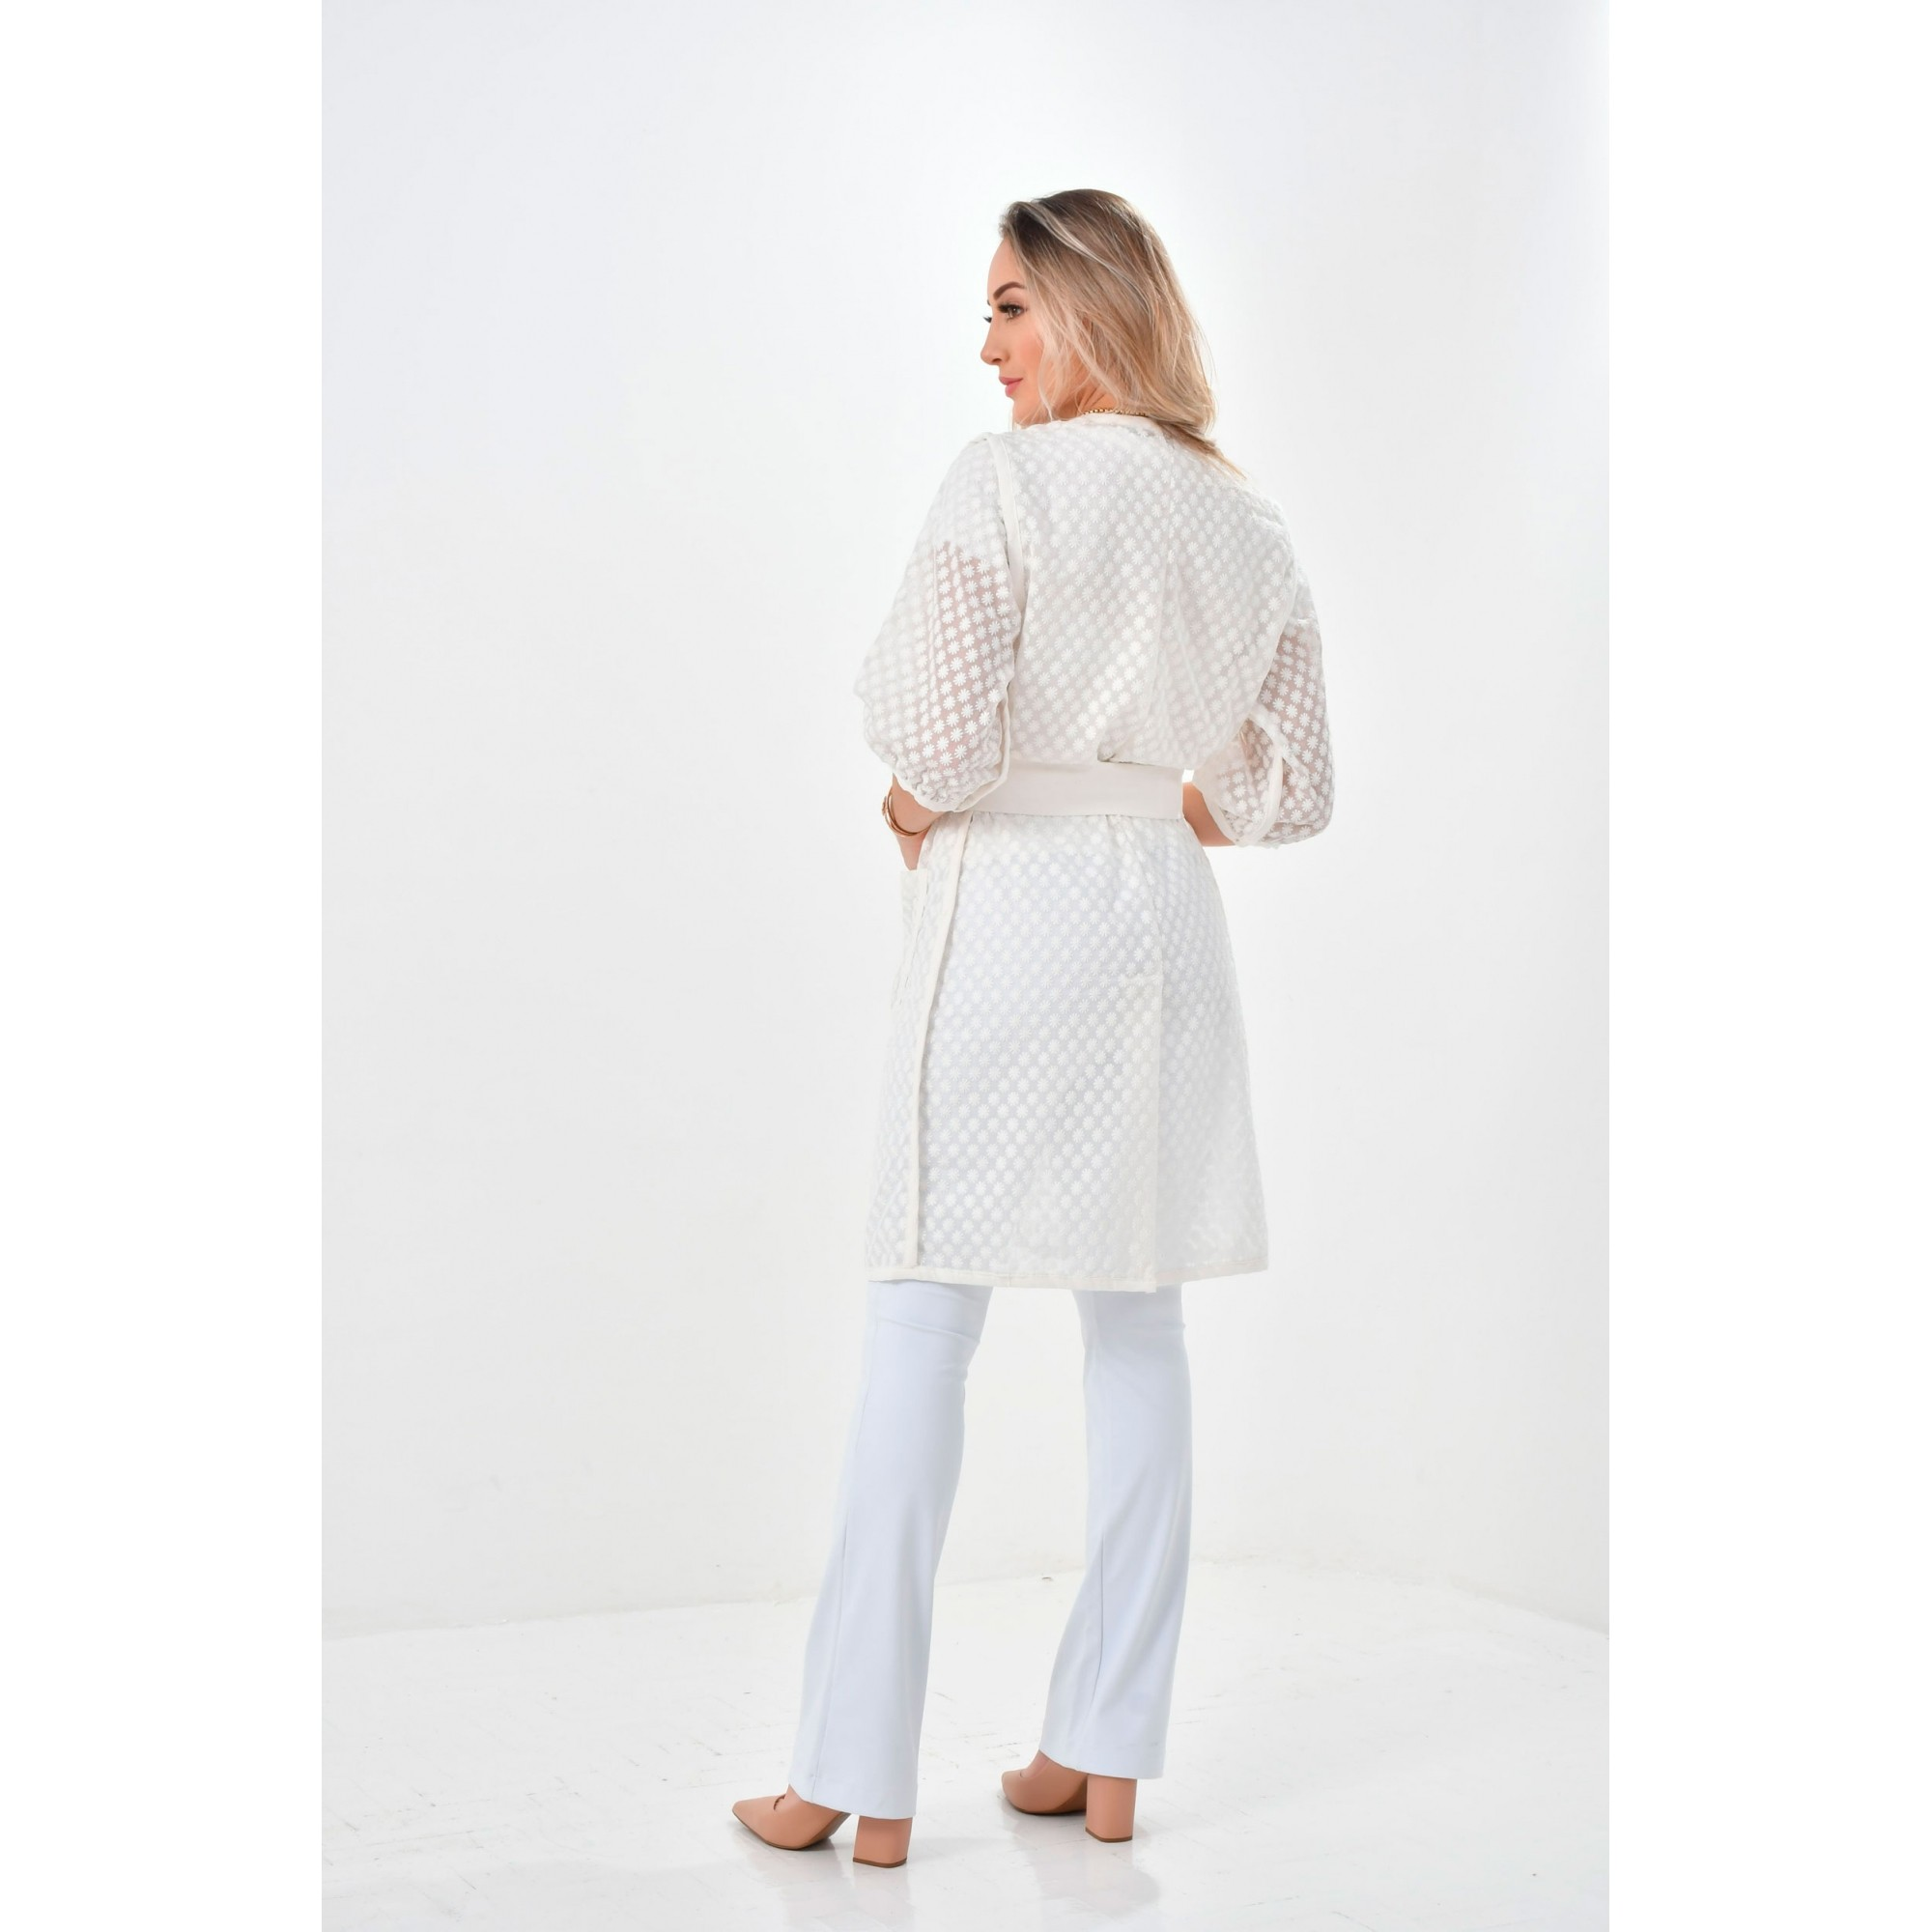 Jaleco Mikaela  - Luxo Branco - Jalecos Personalizado Feminino